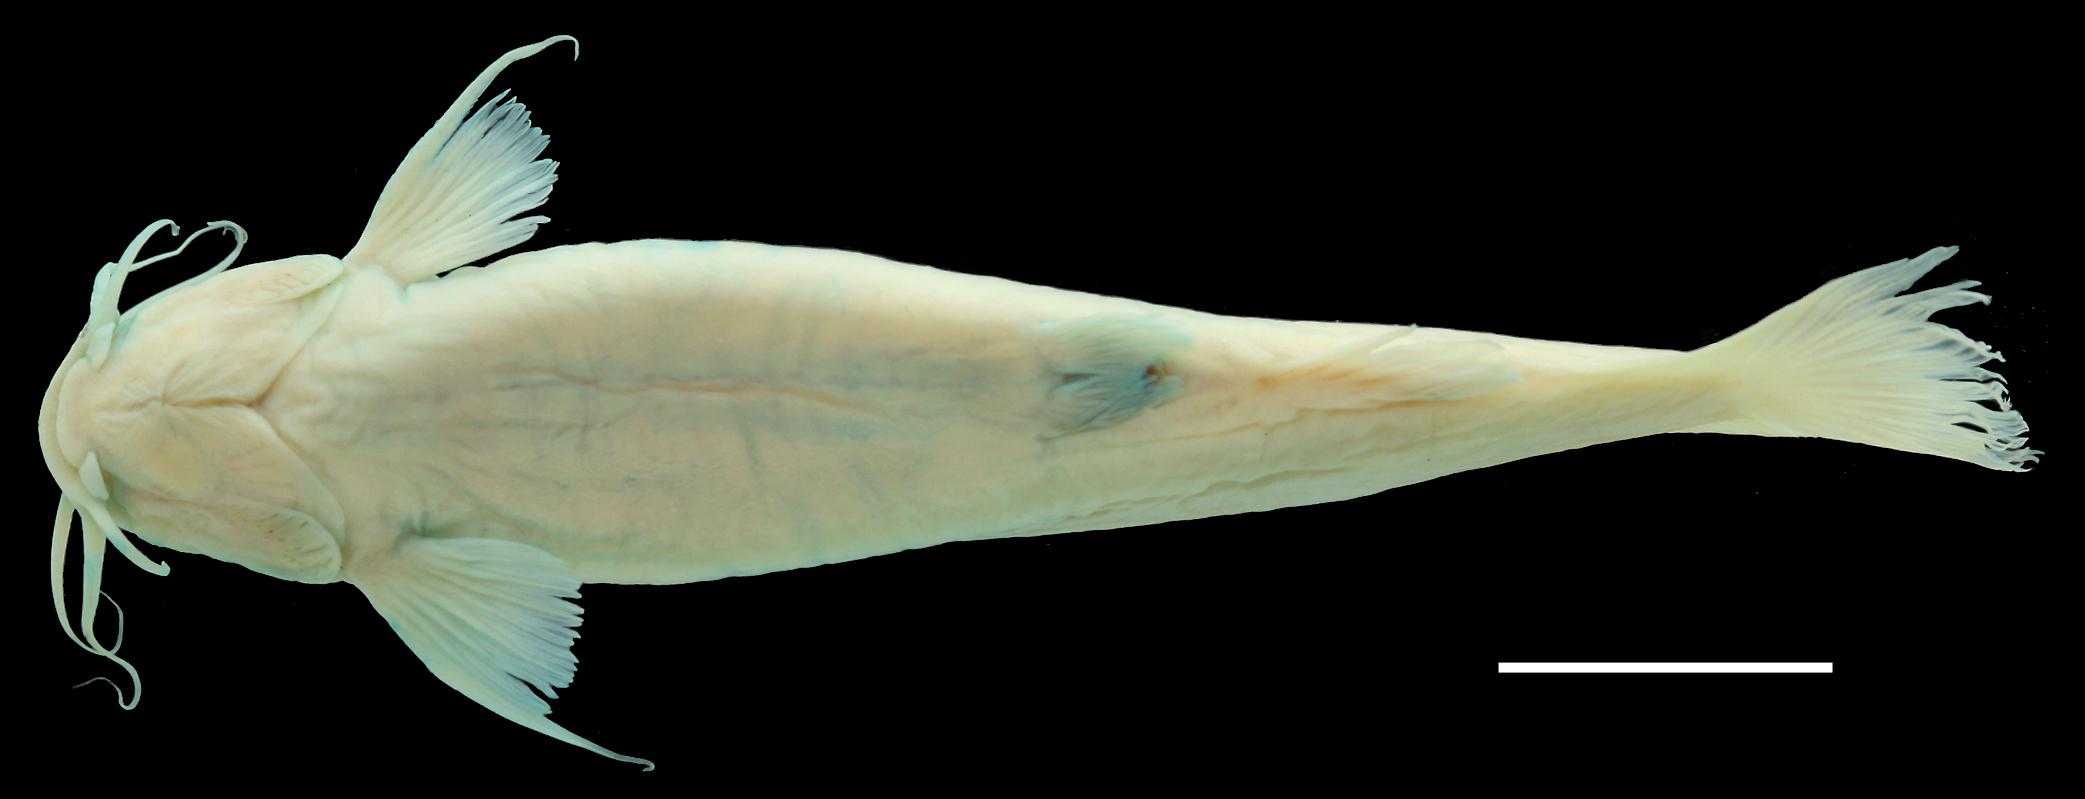 Paratípo de <em>Trichomycterus uisae</em>, IAvH-P-10806_Ventral, 50.1 mm SL (scale bar = 1 cm). Photograph by C. DoNascimiento